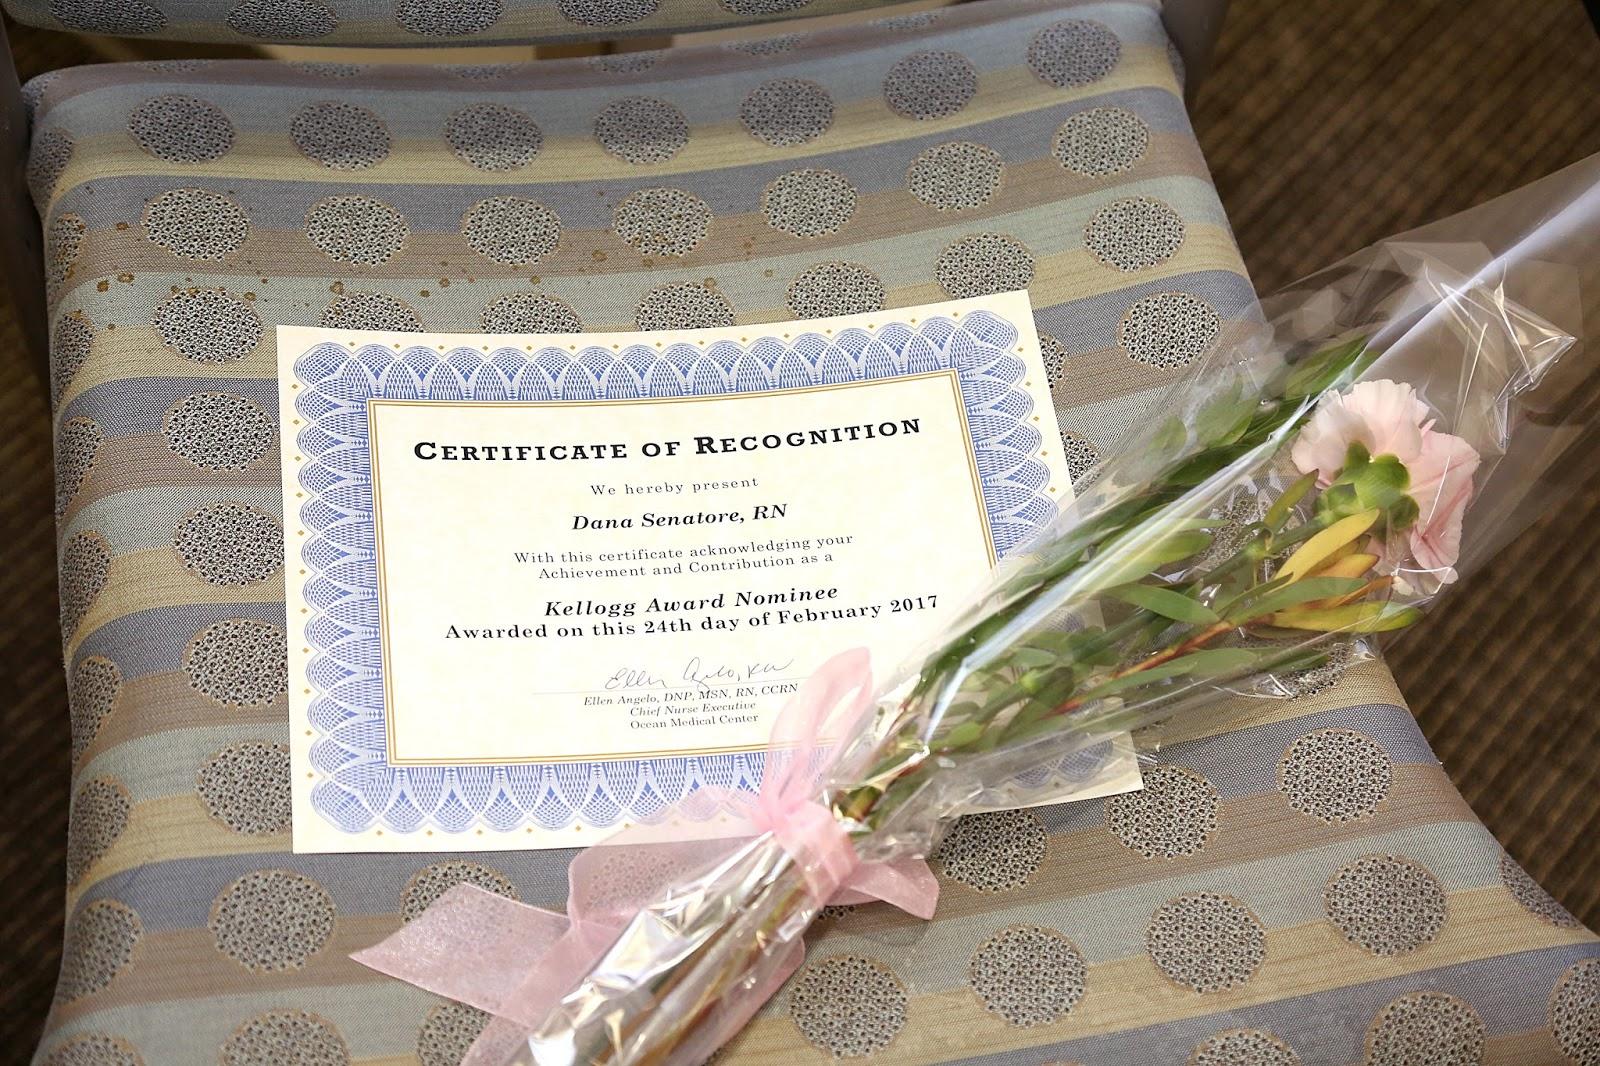 2017 Elizabeth I Kellogg Nursing Awards Suits And Scrubs